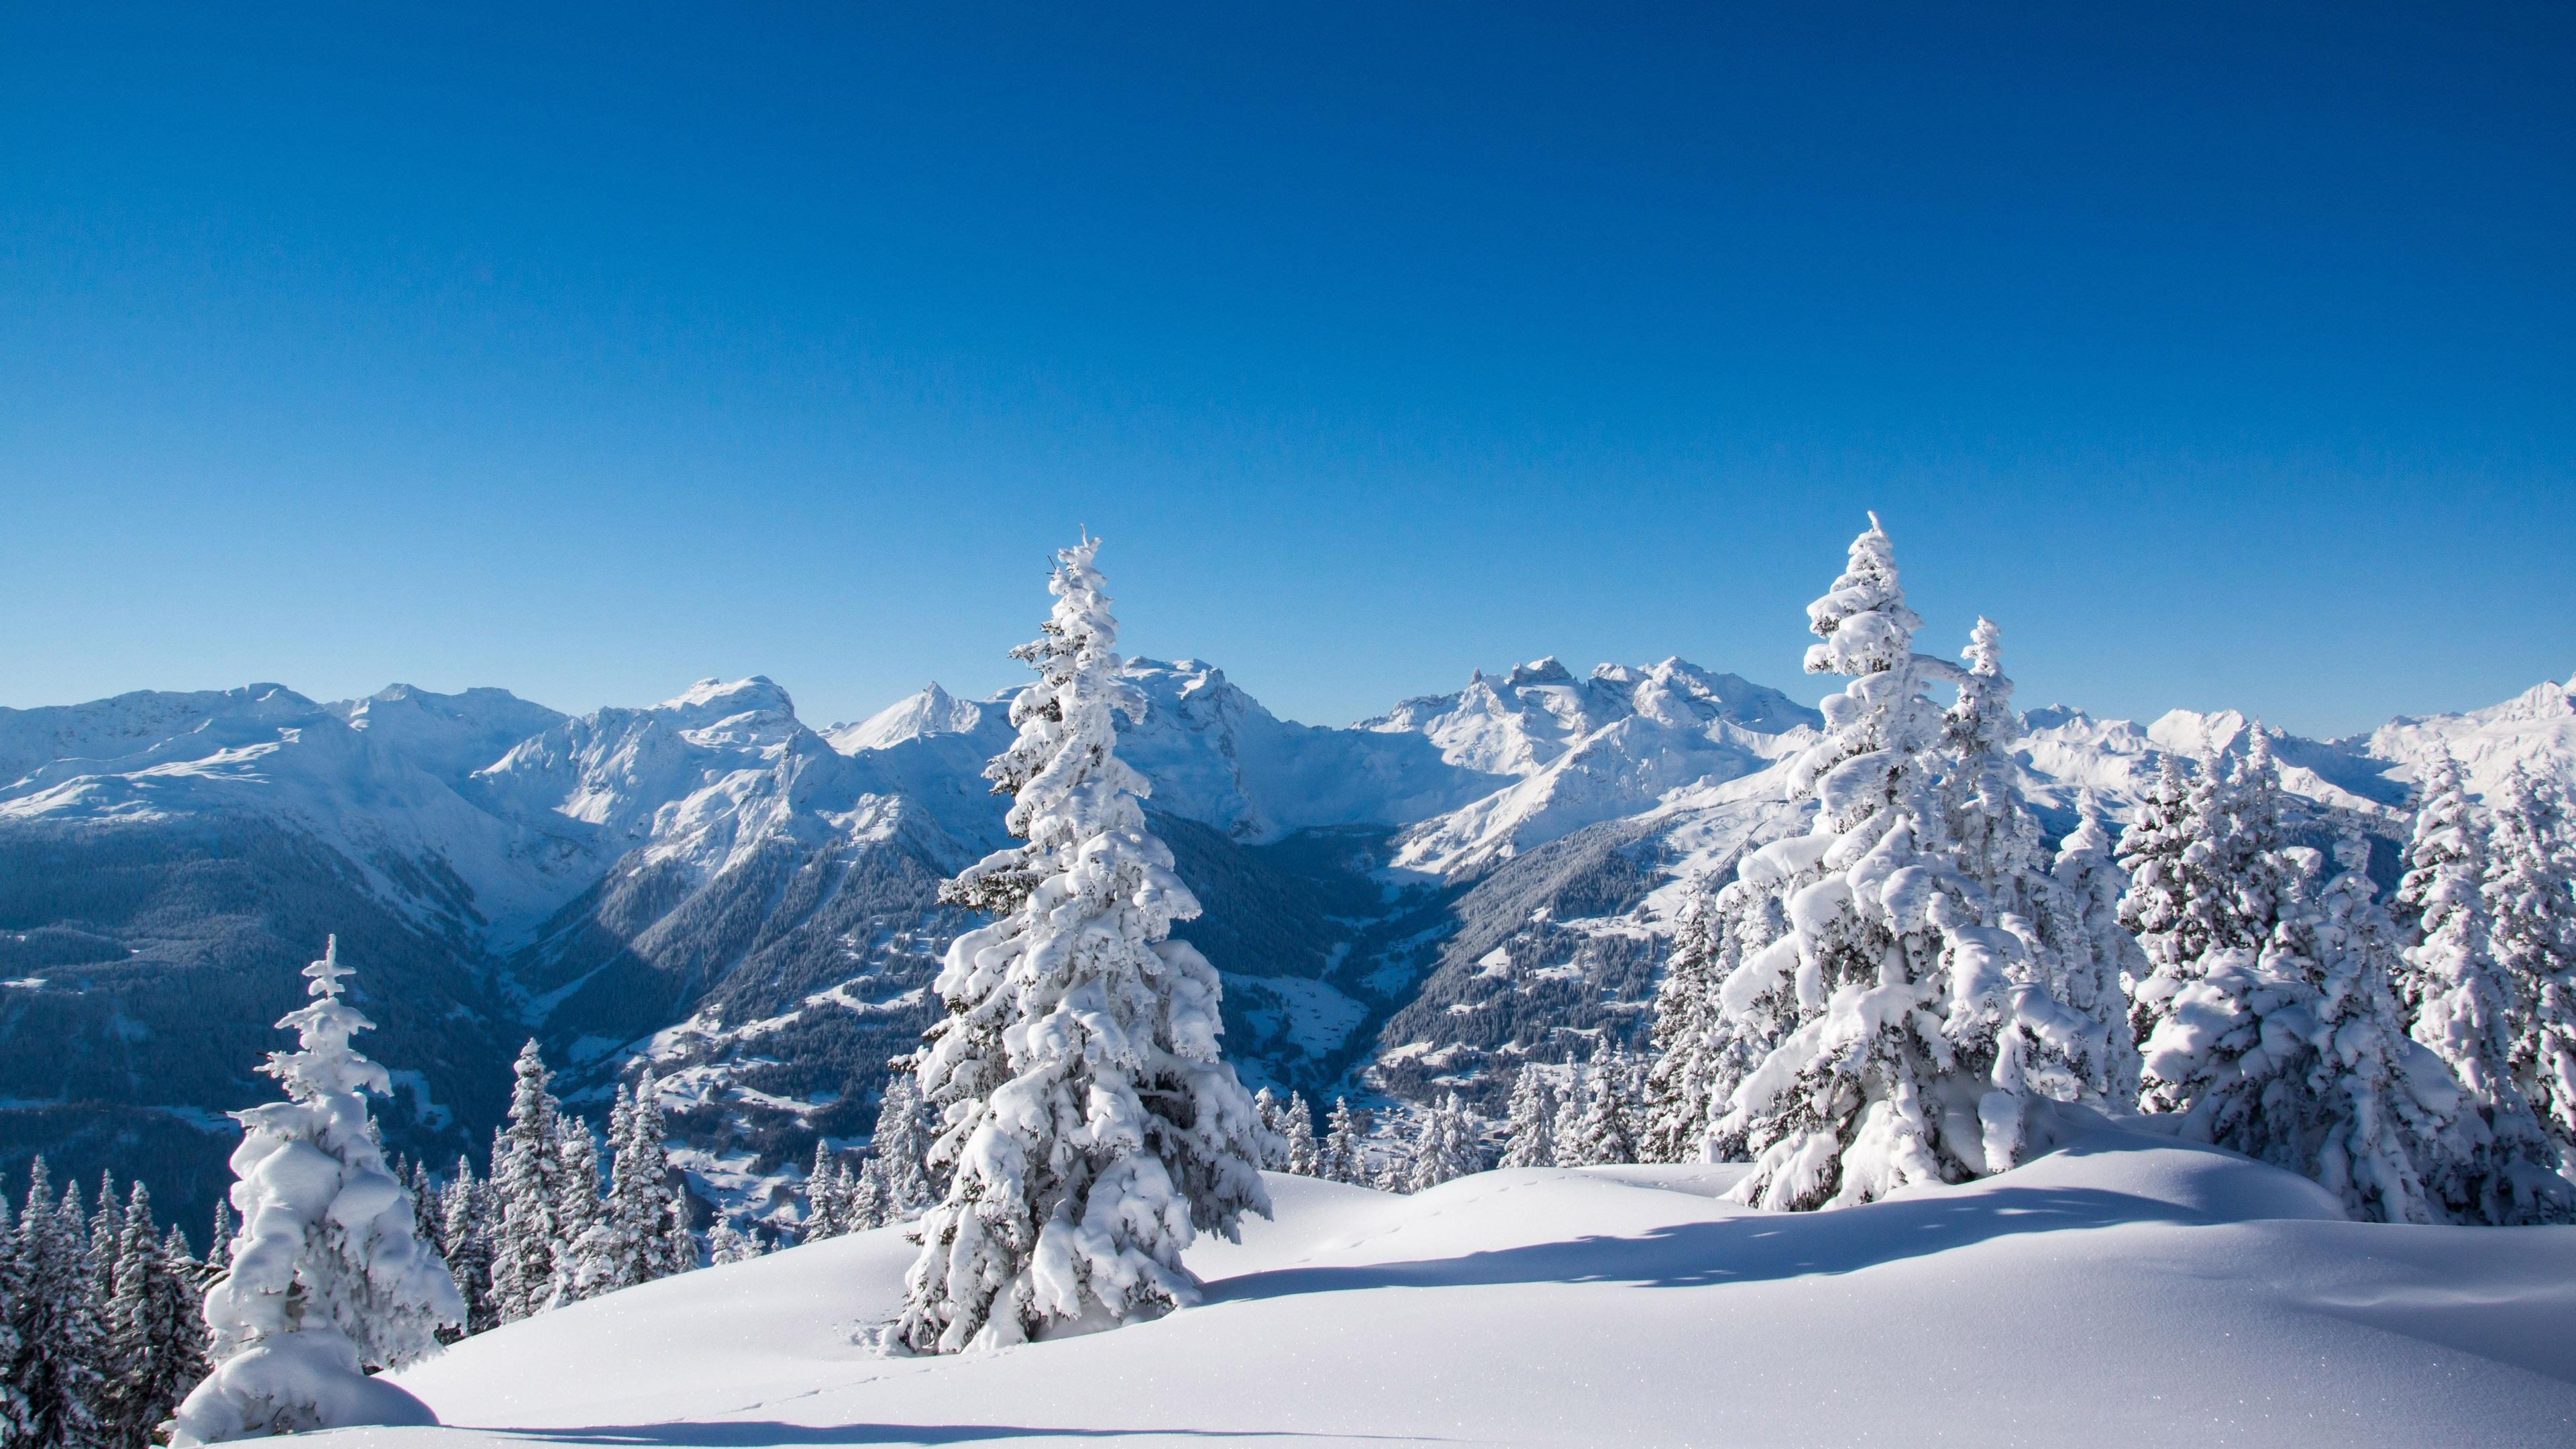 Snowfall Wallpaper 63 Images